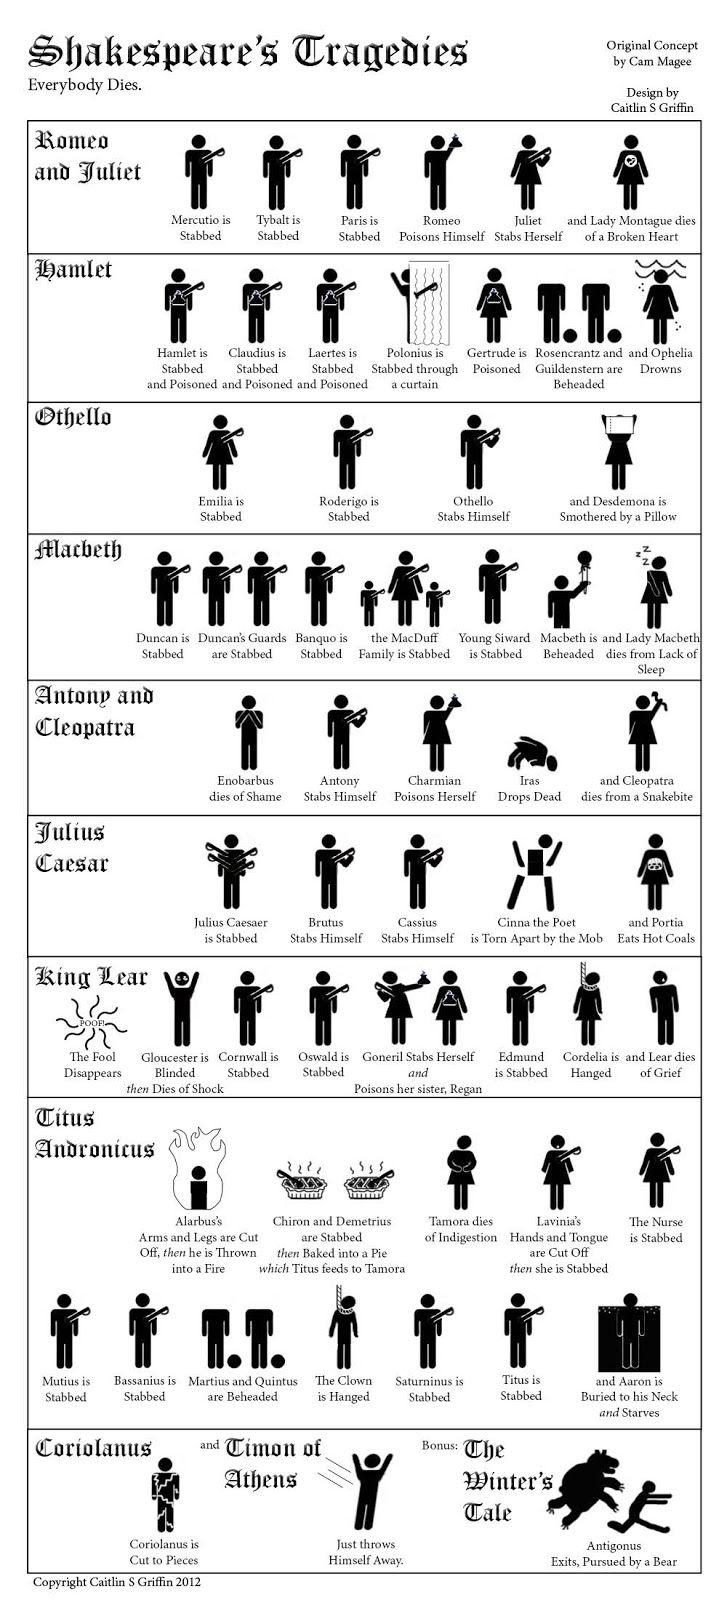 Tragedies simplified